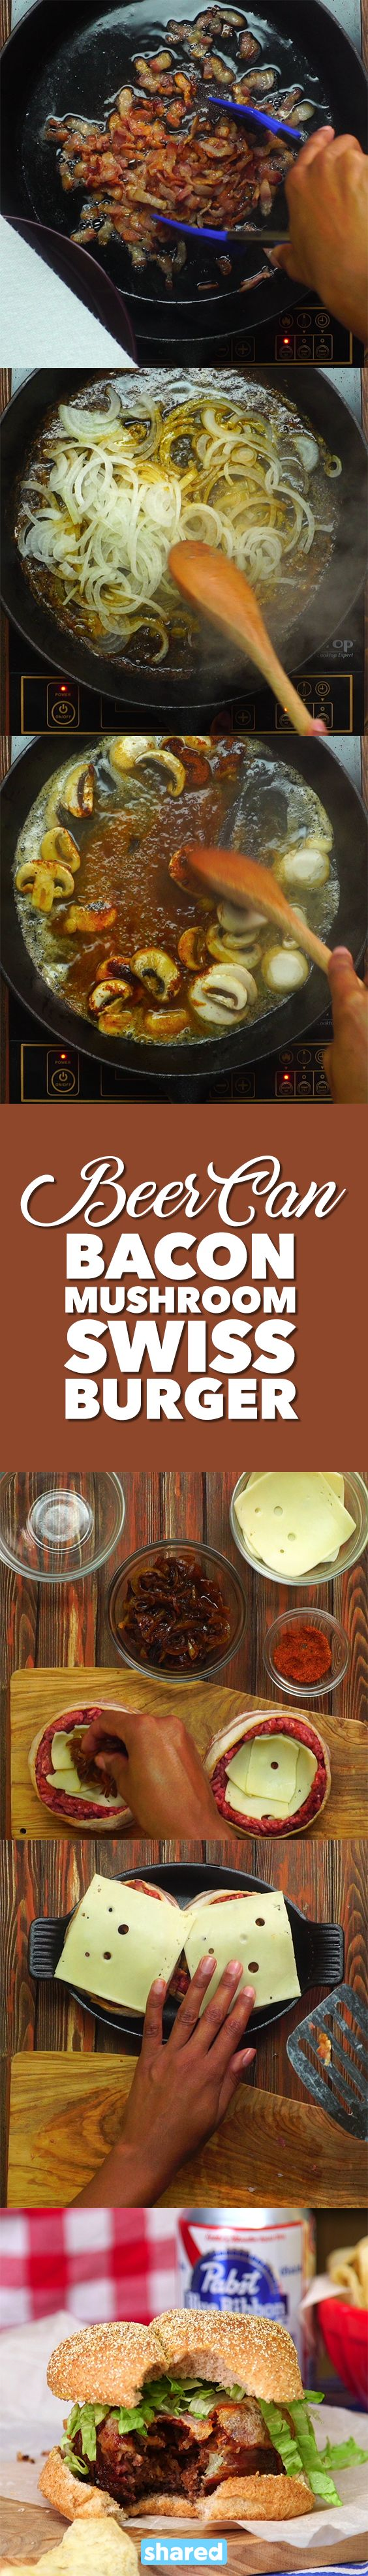 Beer Can Mushroom Swiss Burger